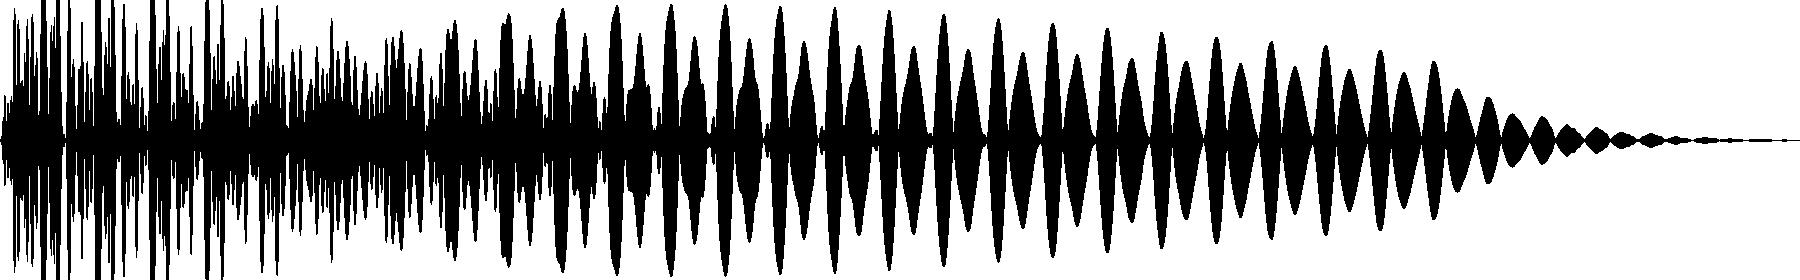 vedh bass cut 072 d